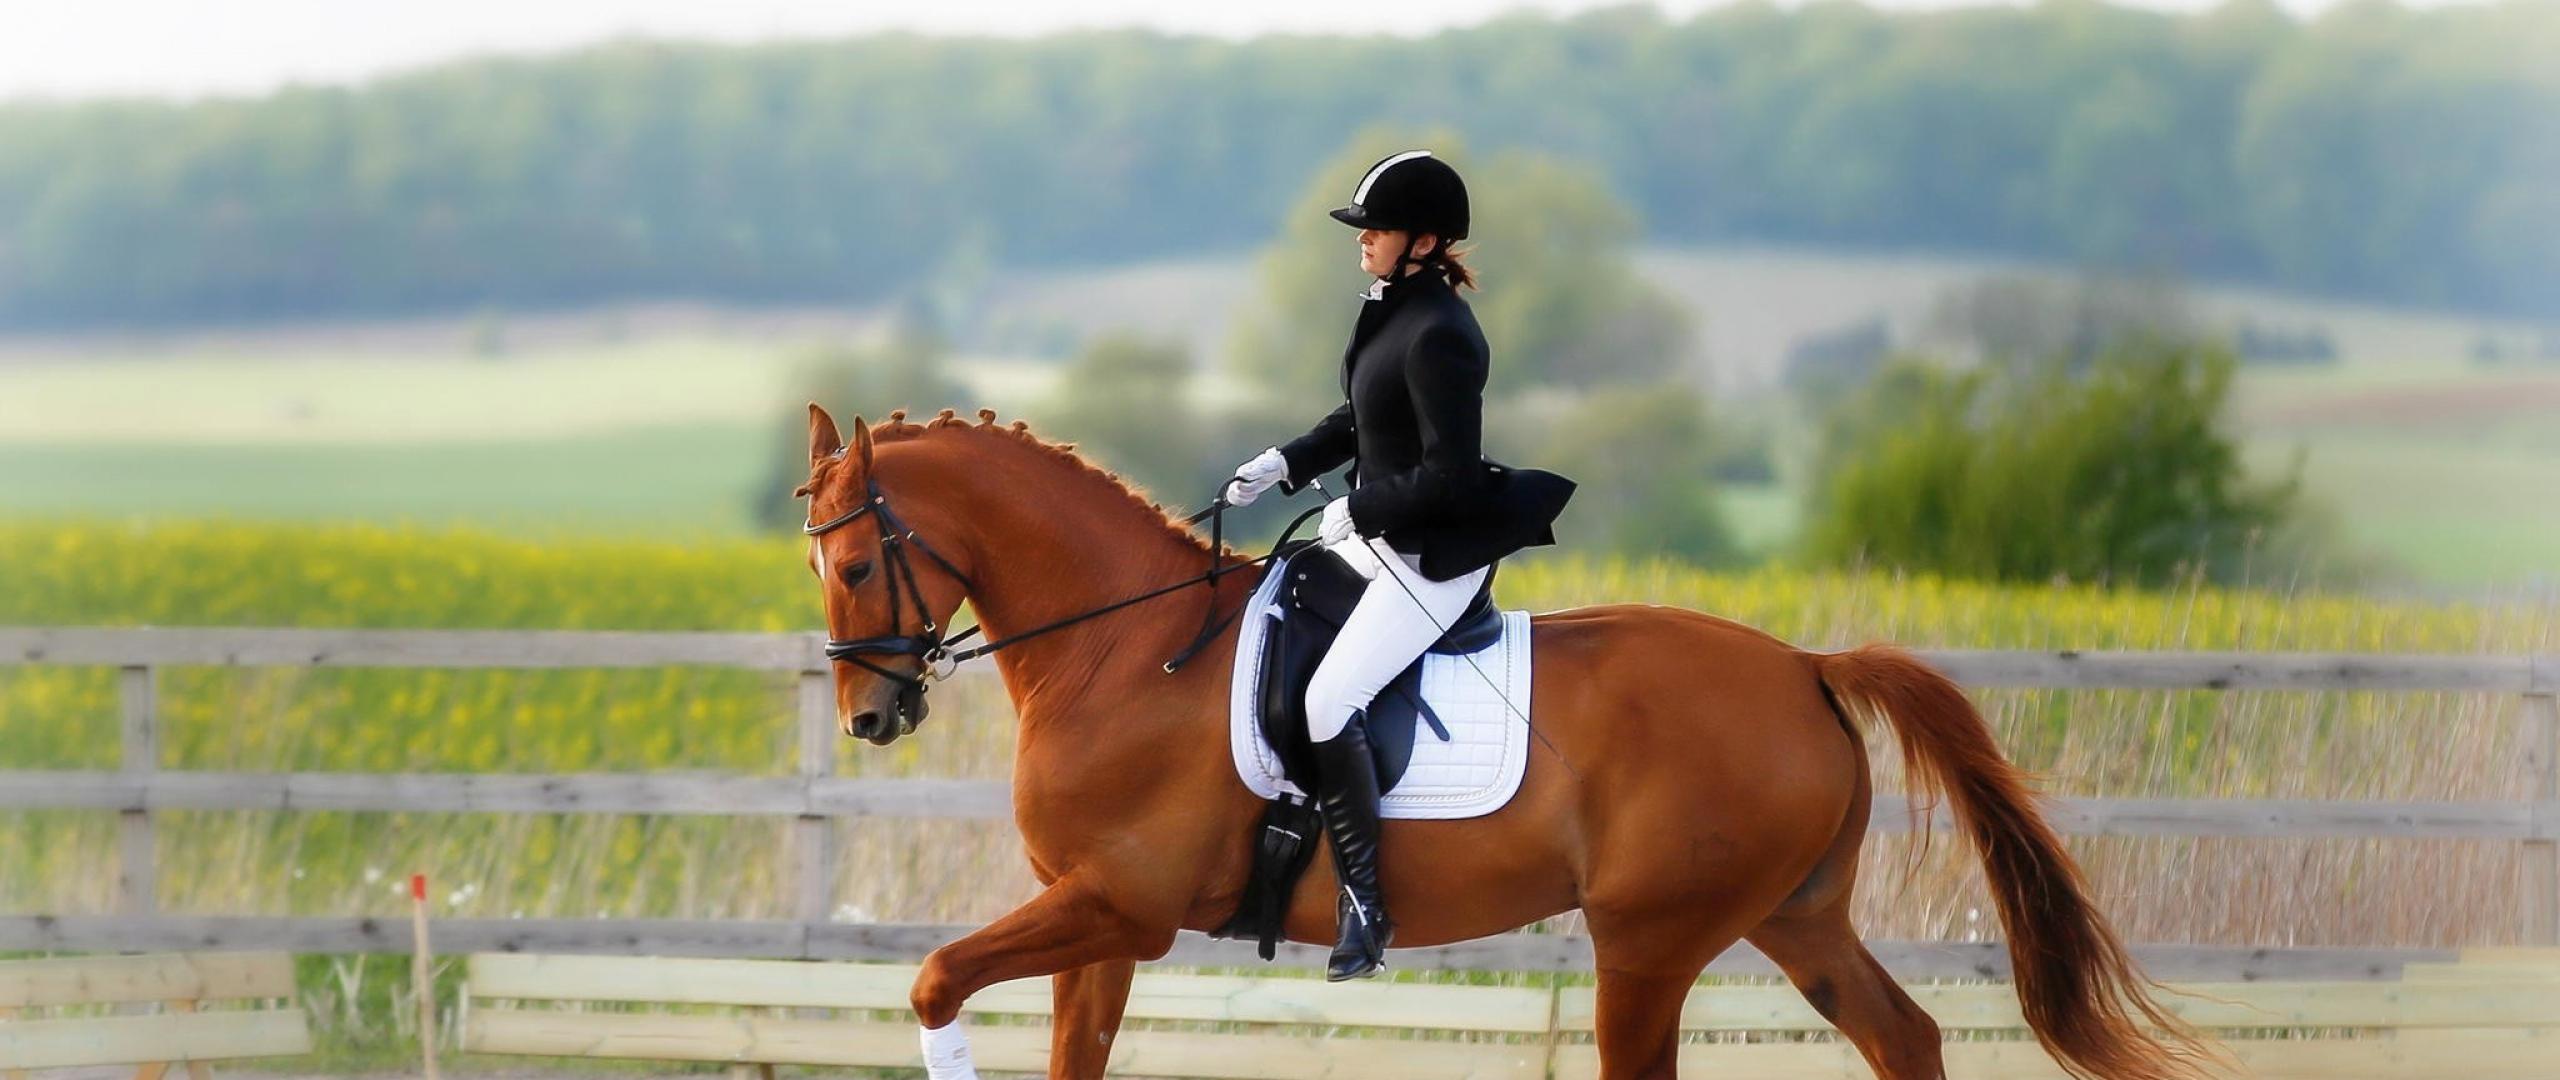 ставки спорт конный shelby на